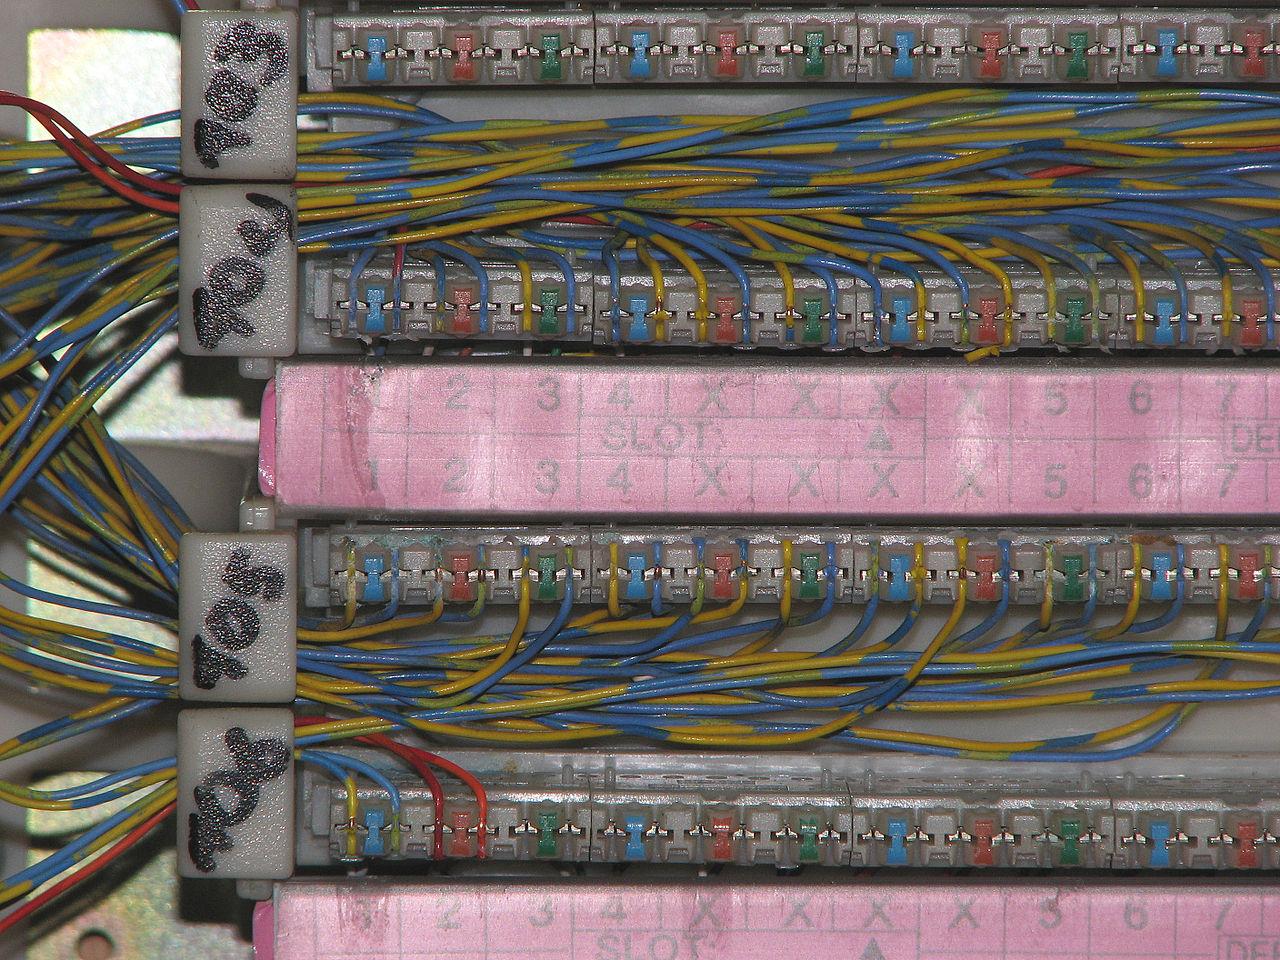 110 Block Rj45 Wiring Diagram File 110 Punch Block Idc 0a Jpg Wikimedia Commons